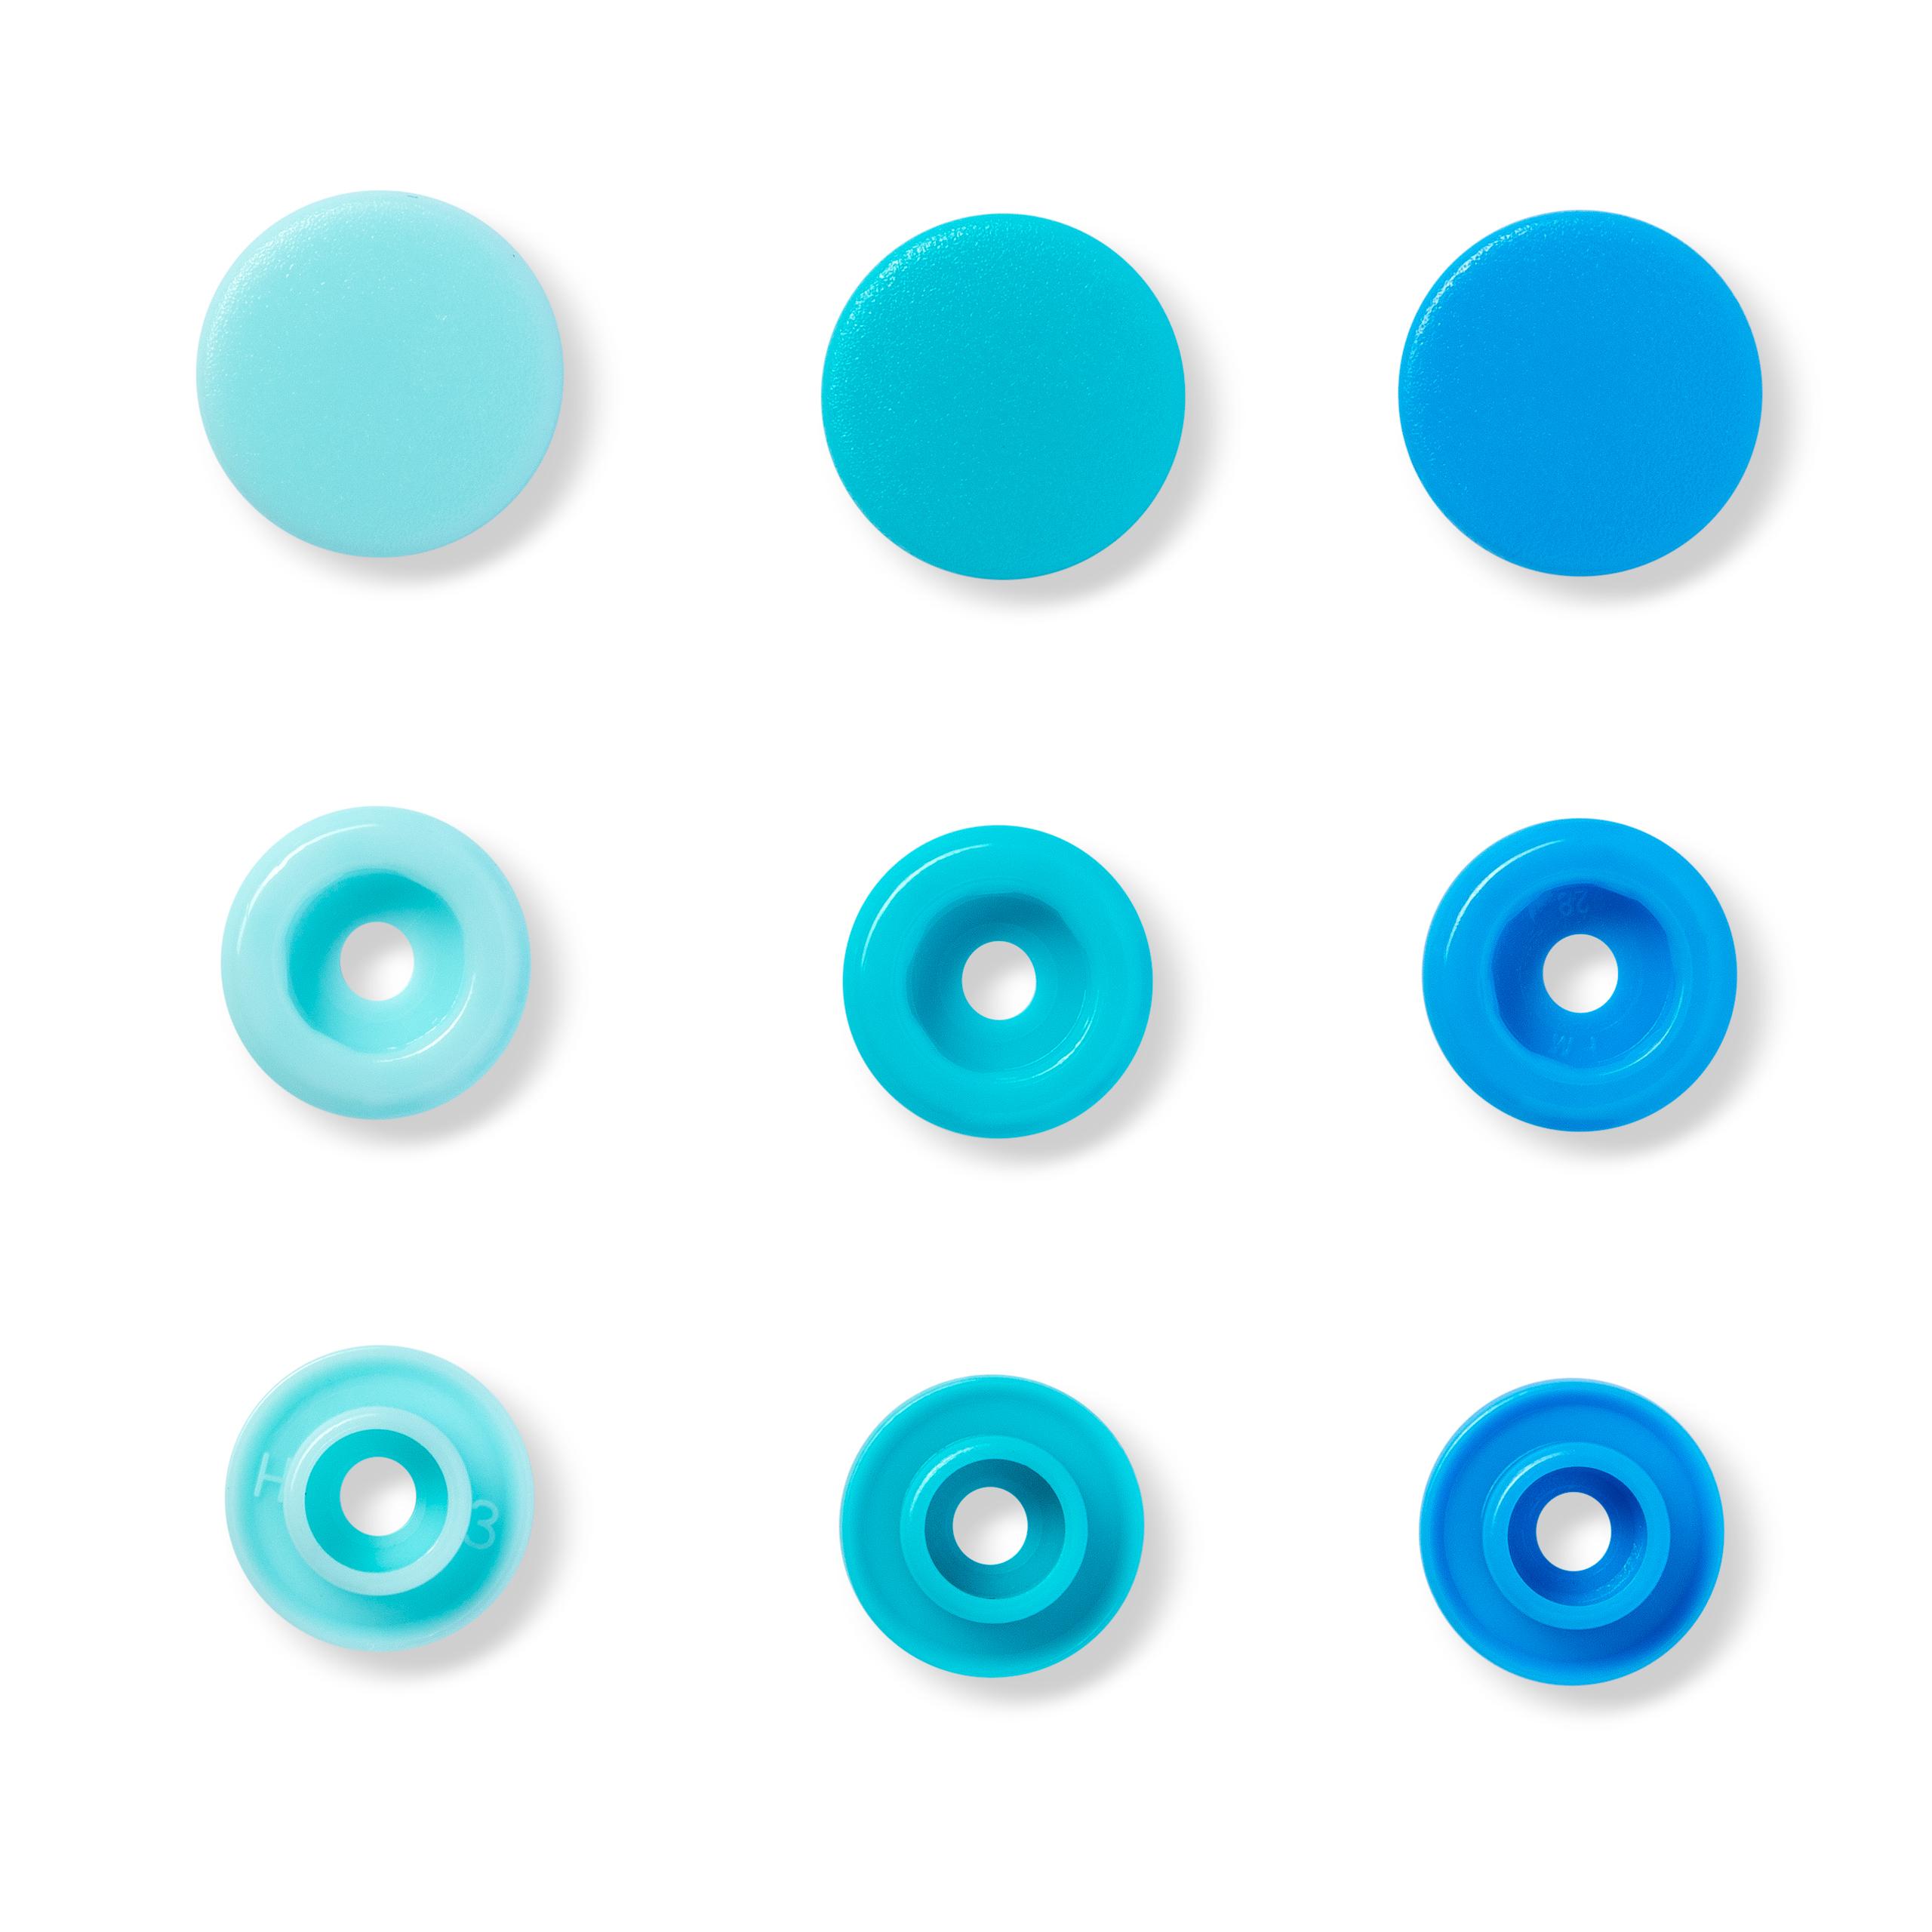 "Druckknopfe Color Snaps, blau, ""Prym-Love"", Prym - Art. 393000"